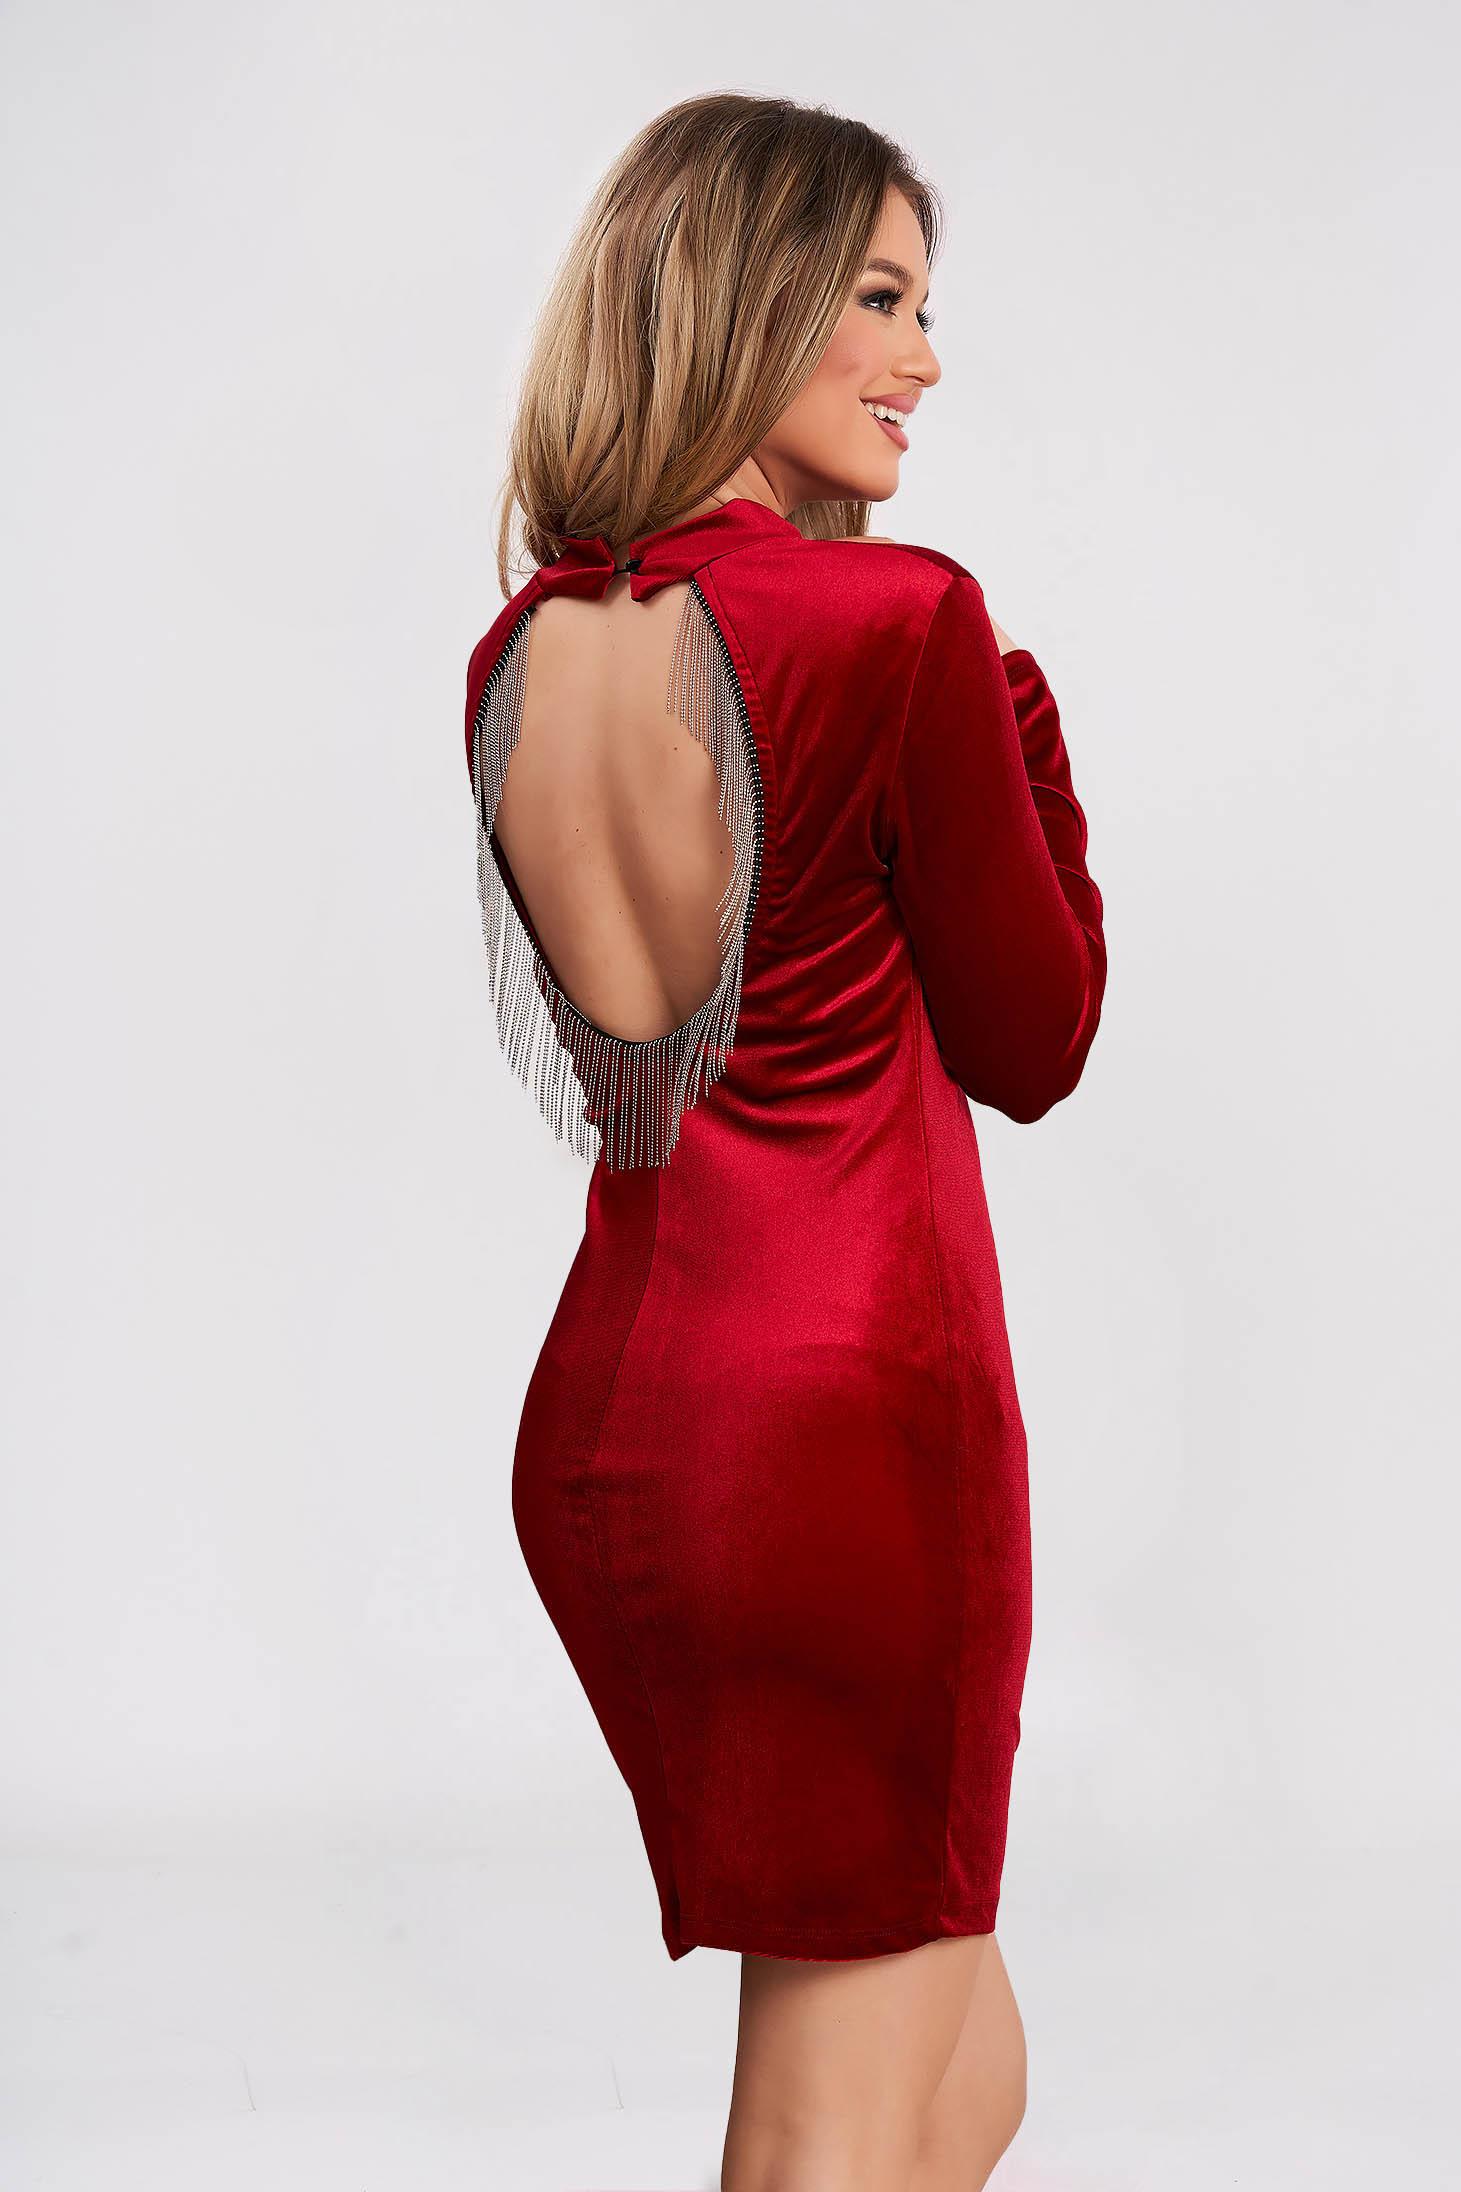 Red dress occasional short cut velvet bare back with fringes pencil